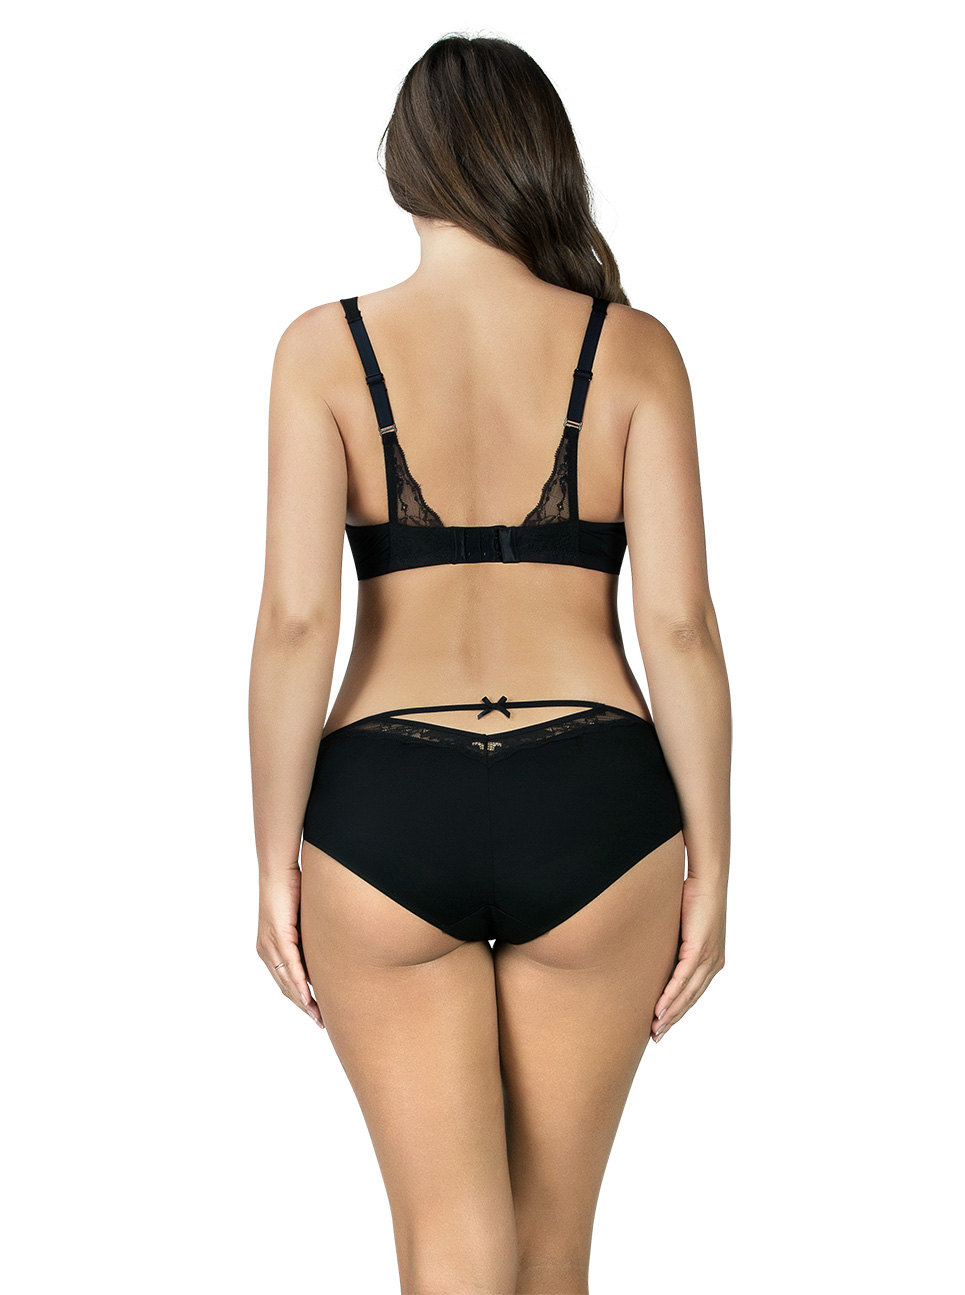 PARFAIT Aubrey PaddedBra P5761 Bikini P5763 Black Back - Aubrey Padded Bra Black P5761